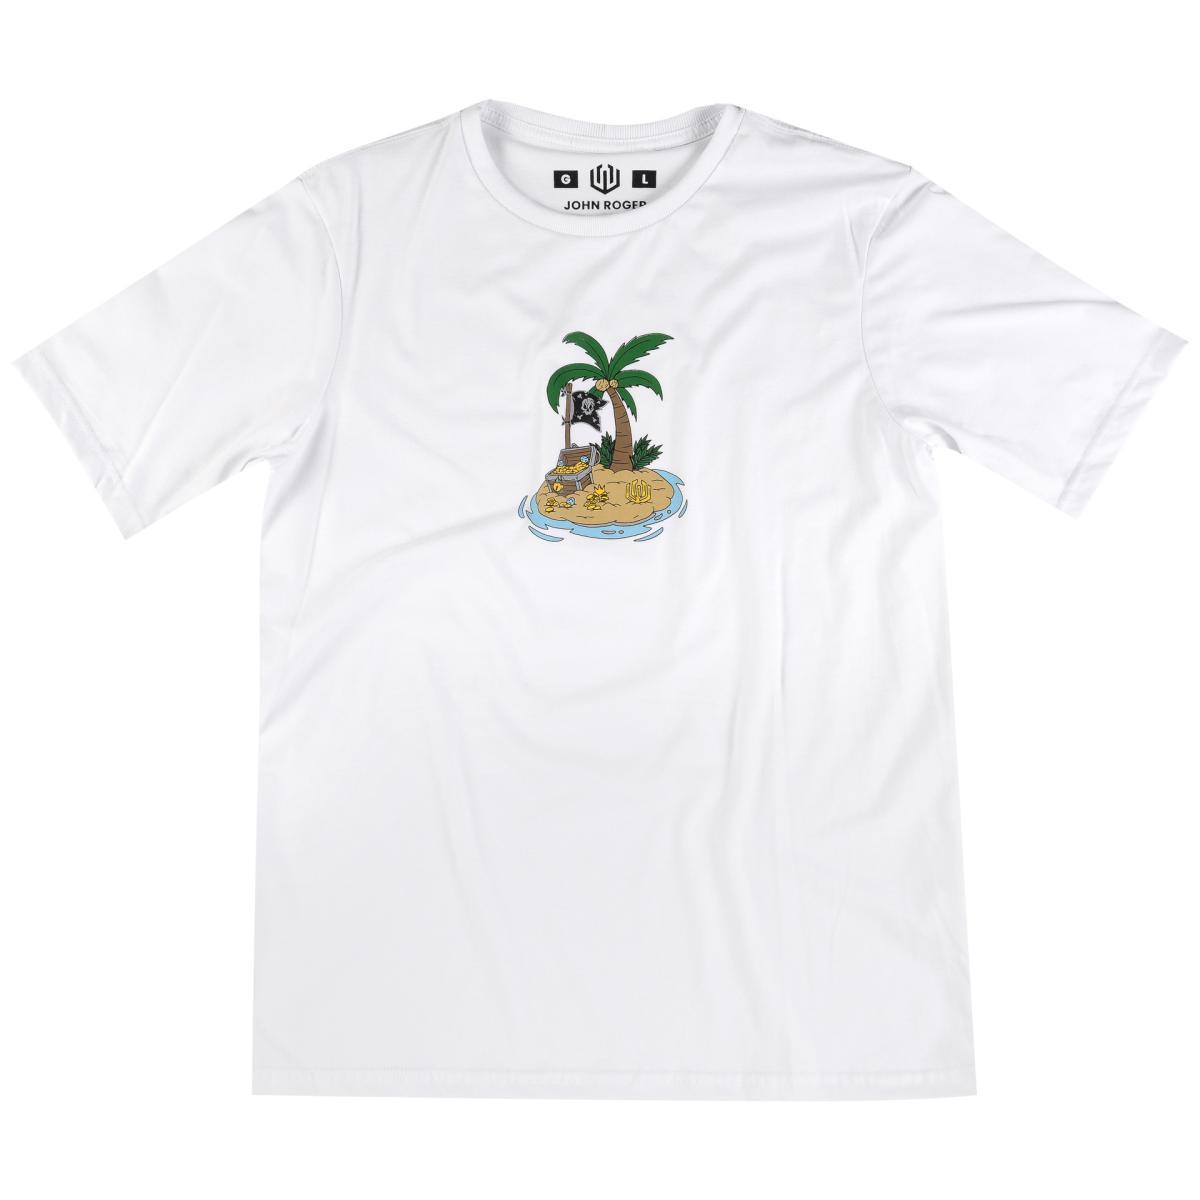 Camiseta John Roger Treasure Island - branca